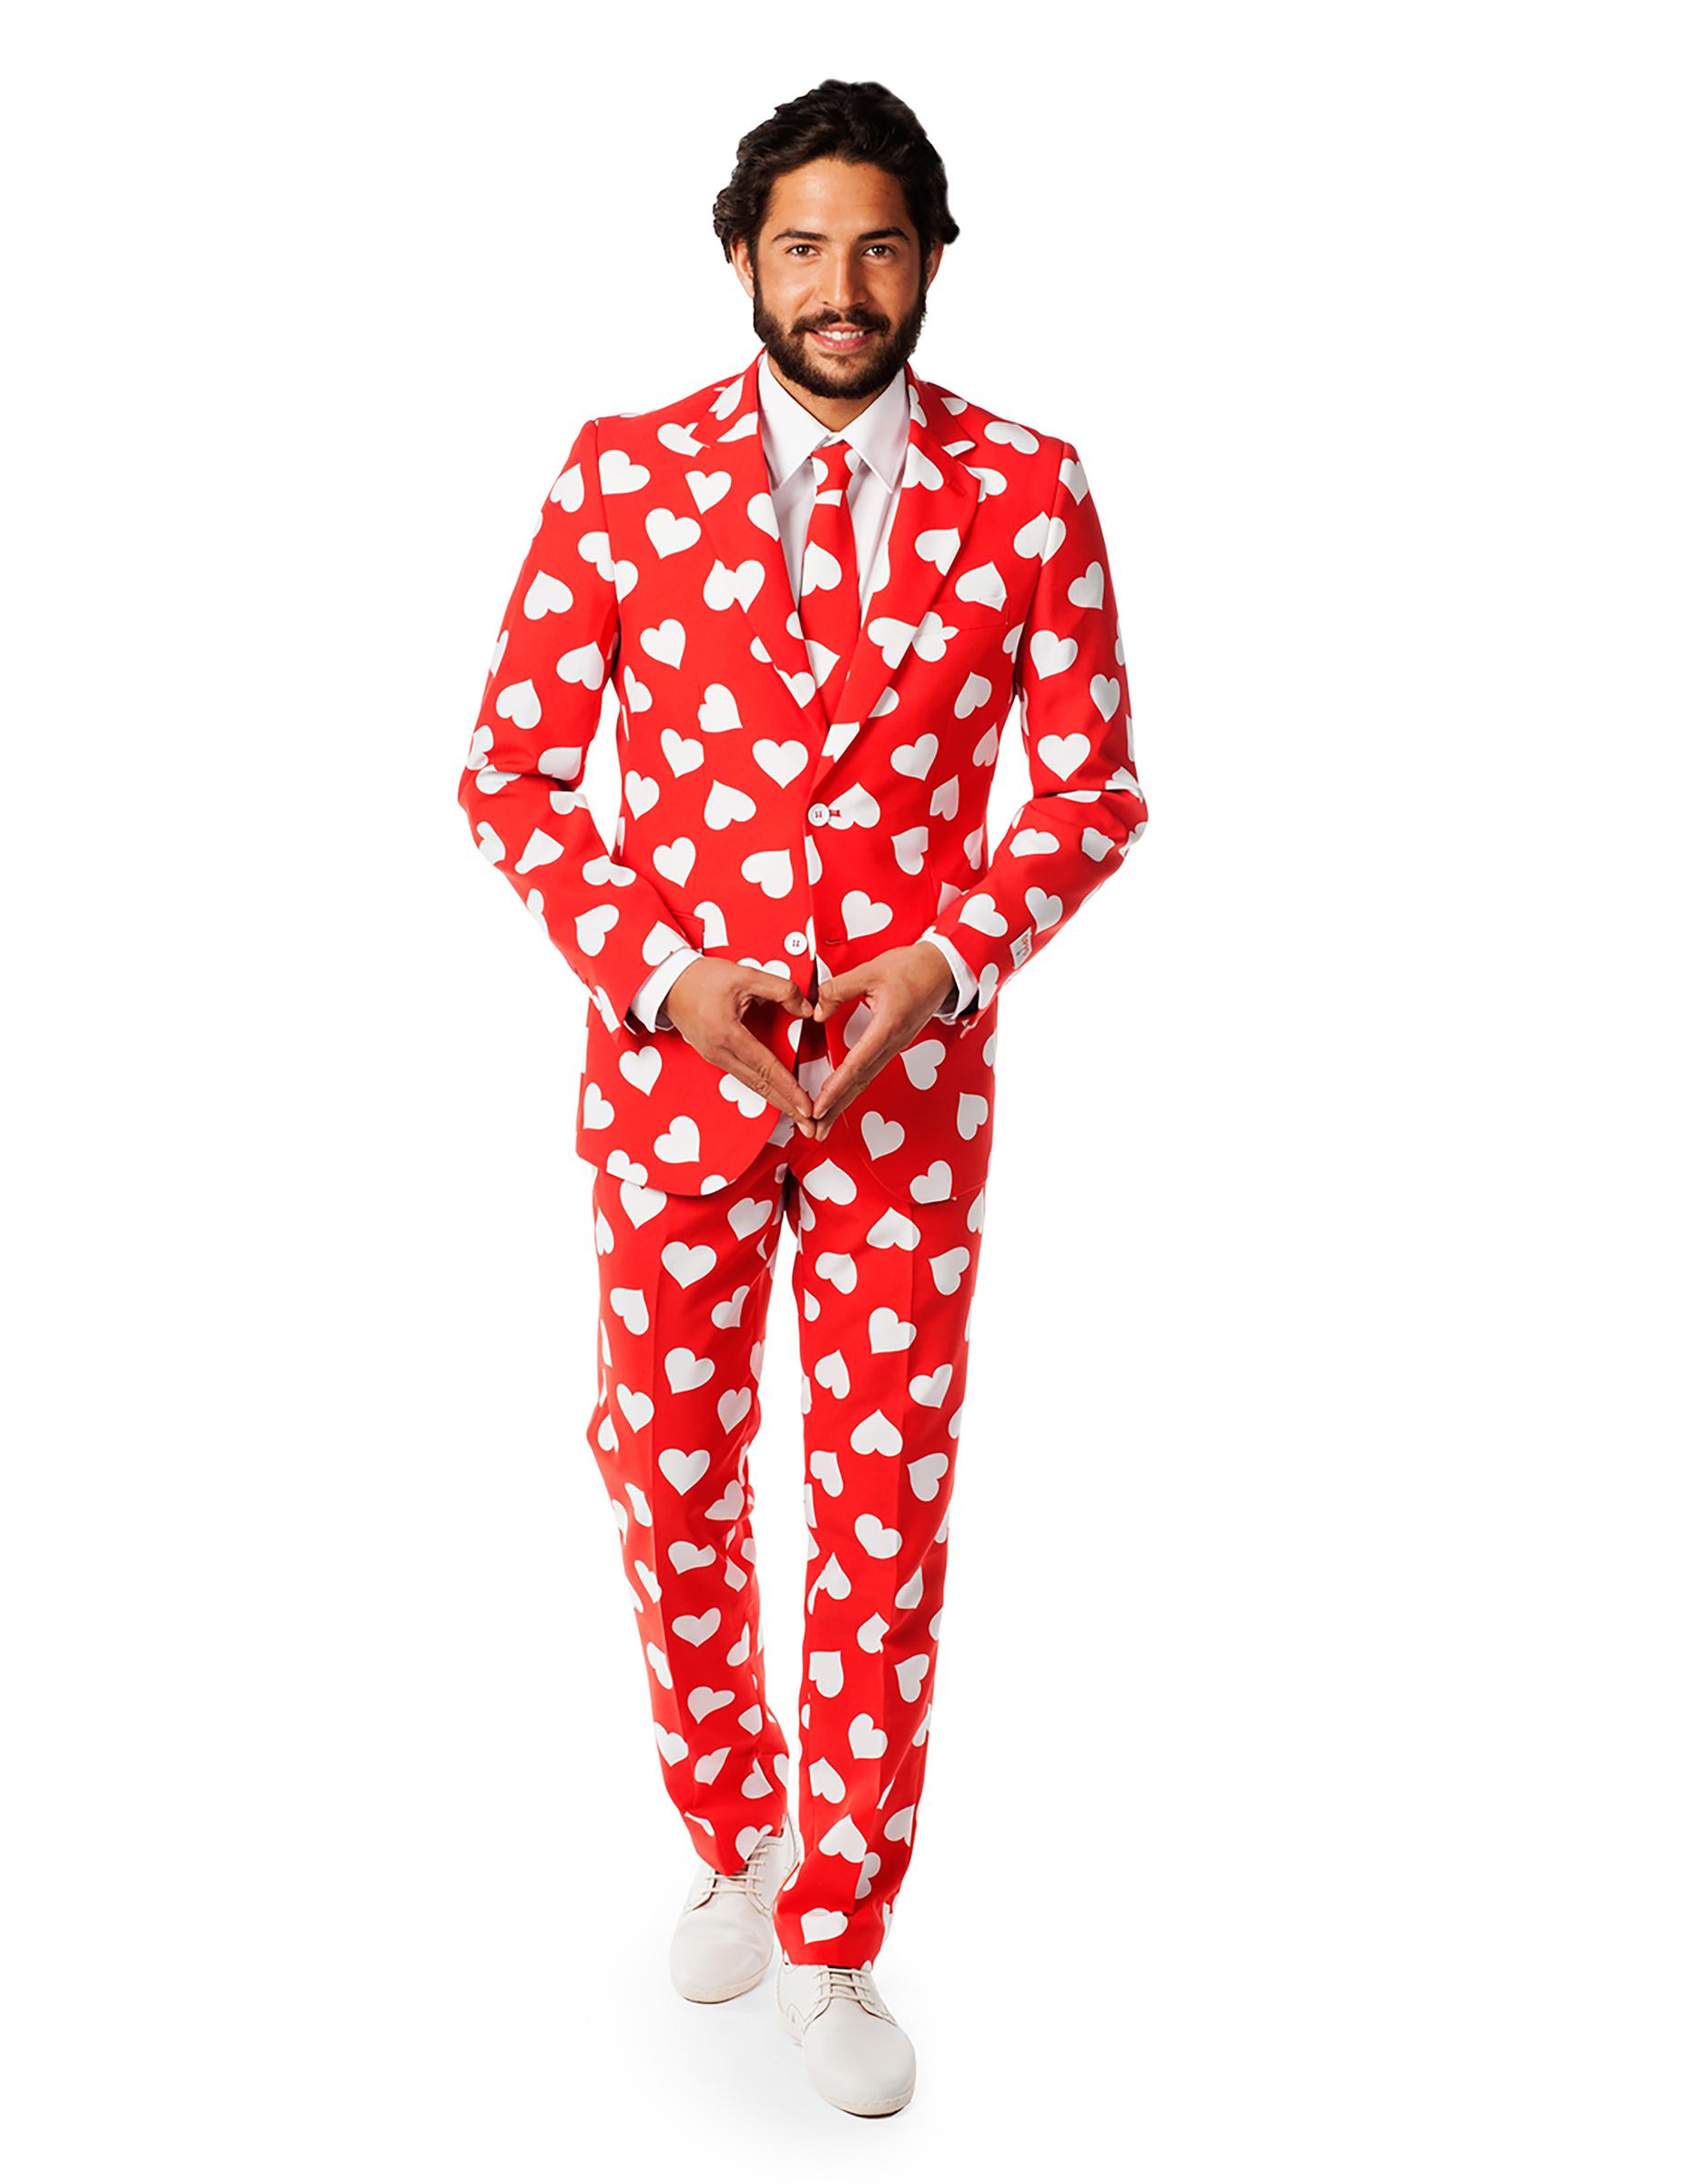 costume mr saint valentin homme opposuits d coration anniversaire et f tes th me sur vegaoo. Black Bedroom Furniture Sets. Home Design Ideas